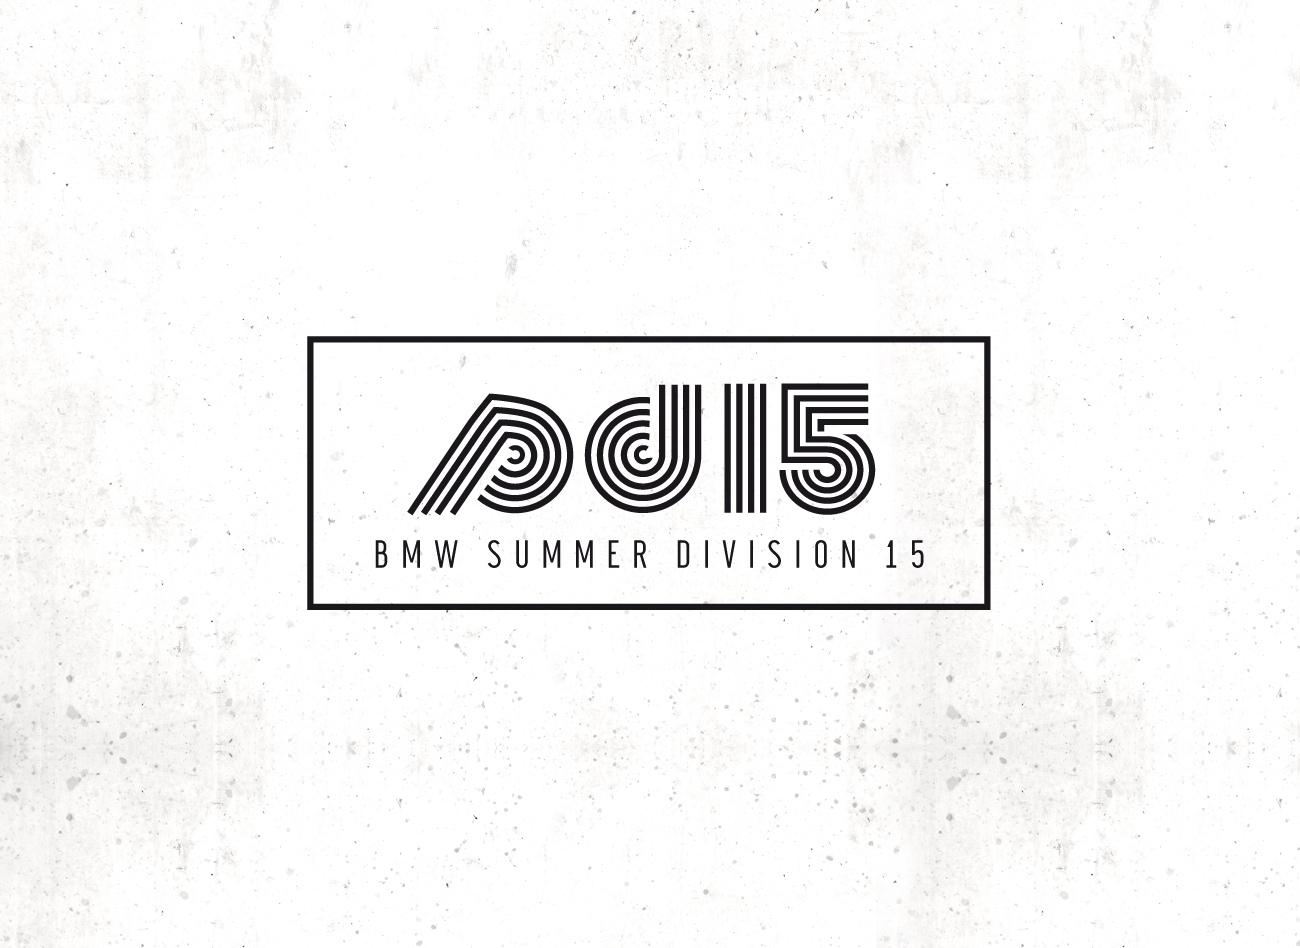 Logogestaltung / summerdivision 15